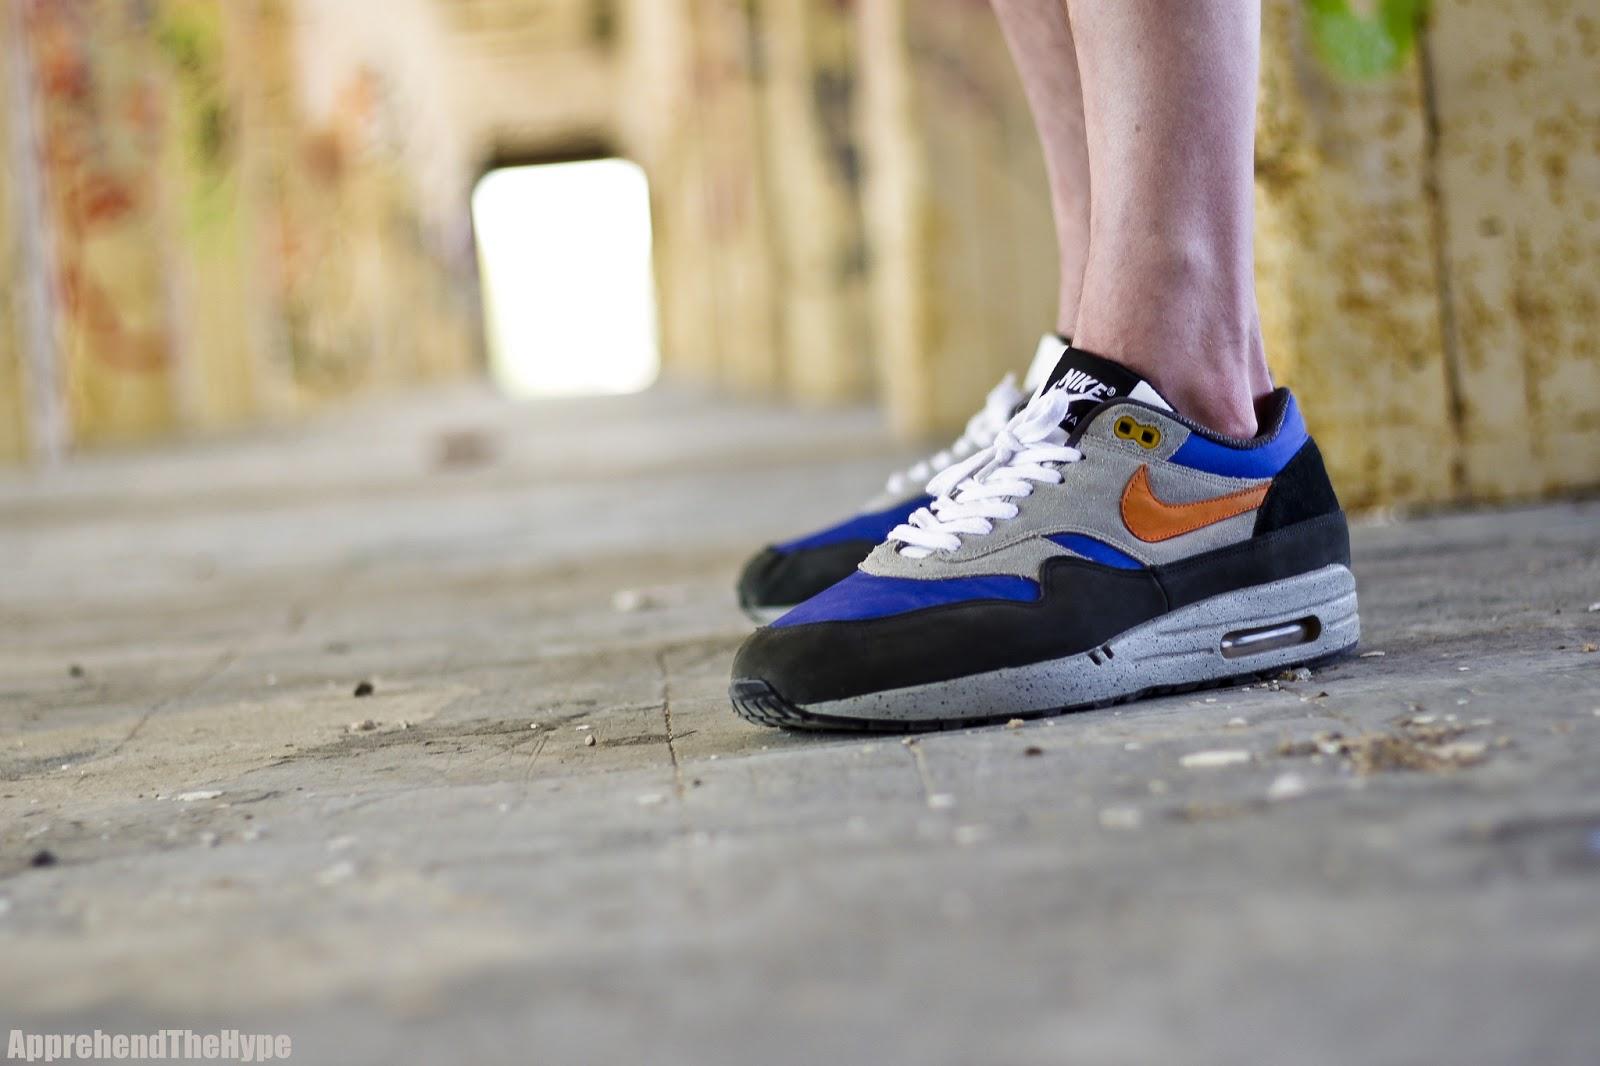 1b965ff0dd apprehend the hype: Nike Air Max 1 - Skull Pack / Blue / Orange